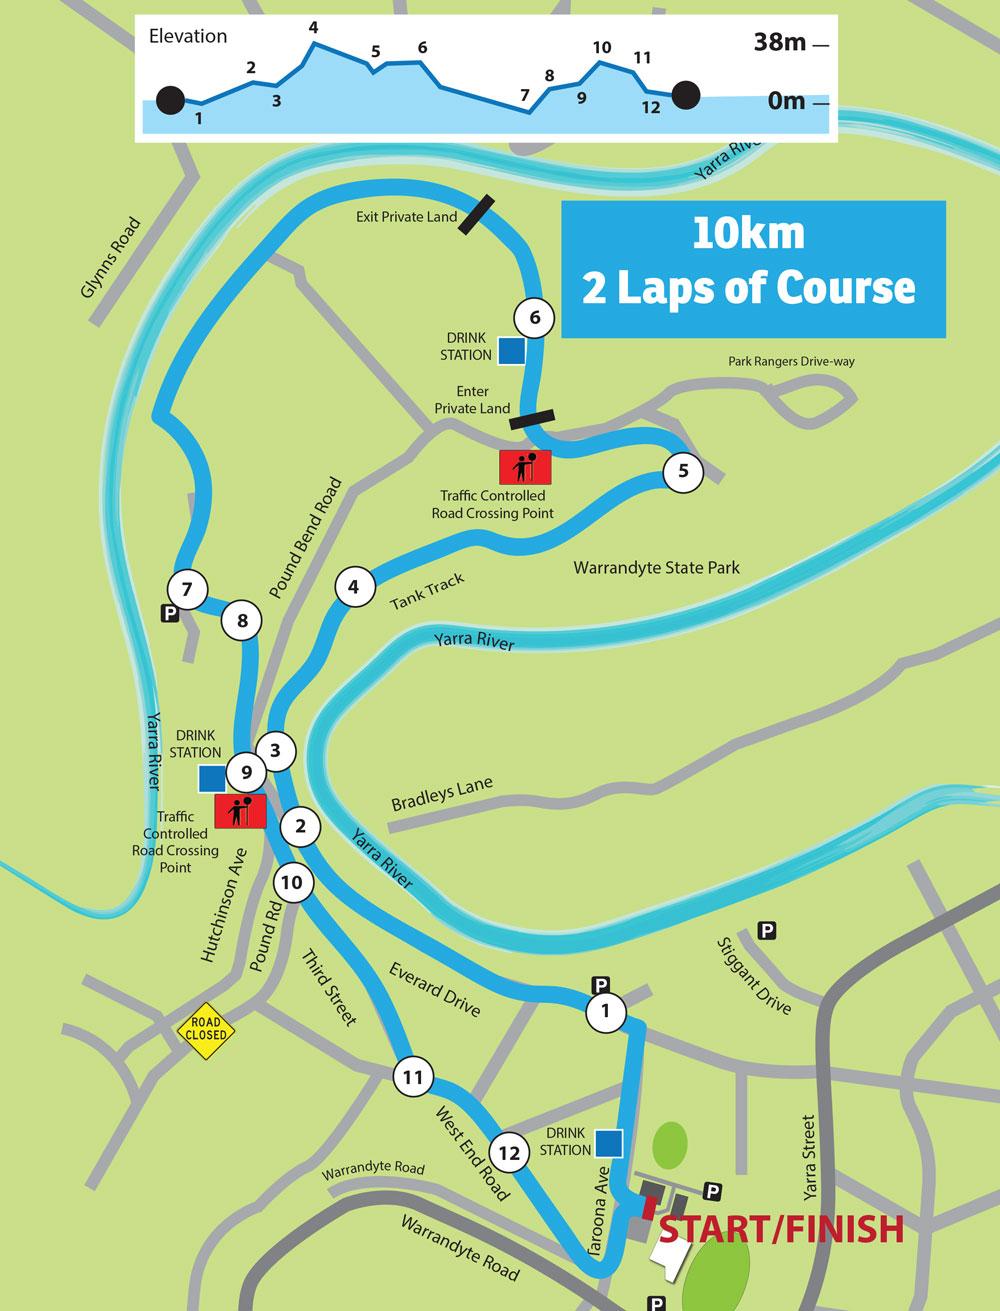 10km course for Run Warrandyte